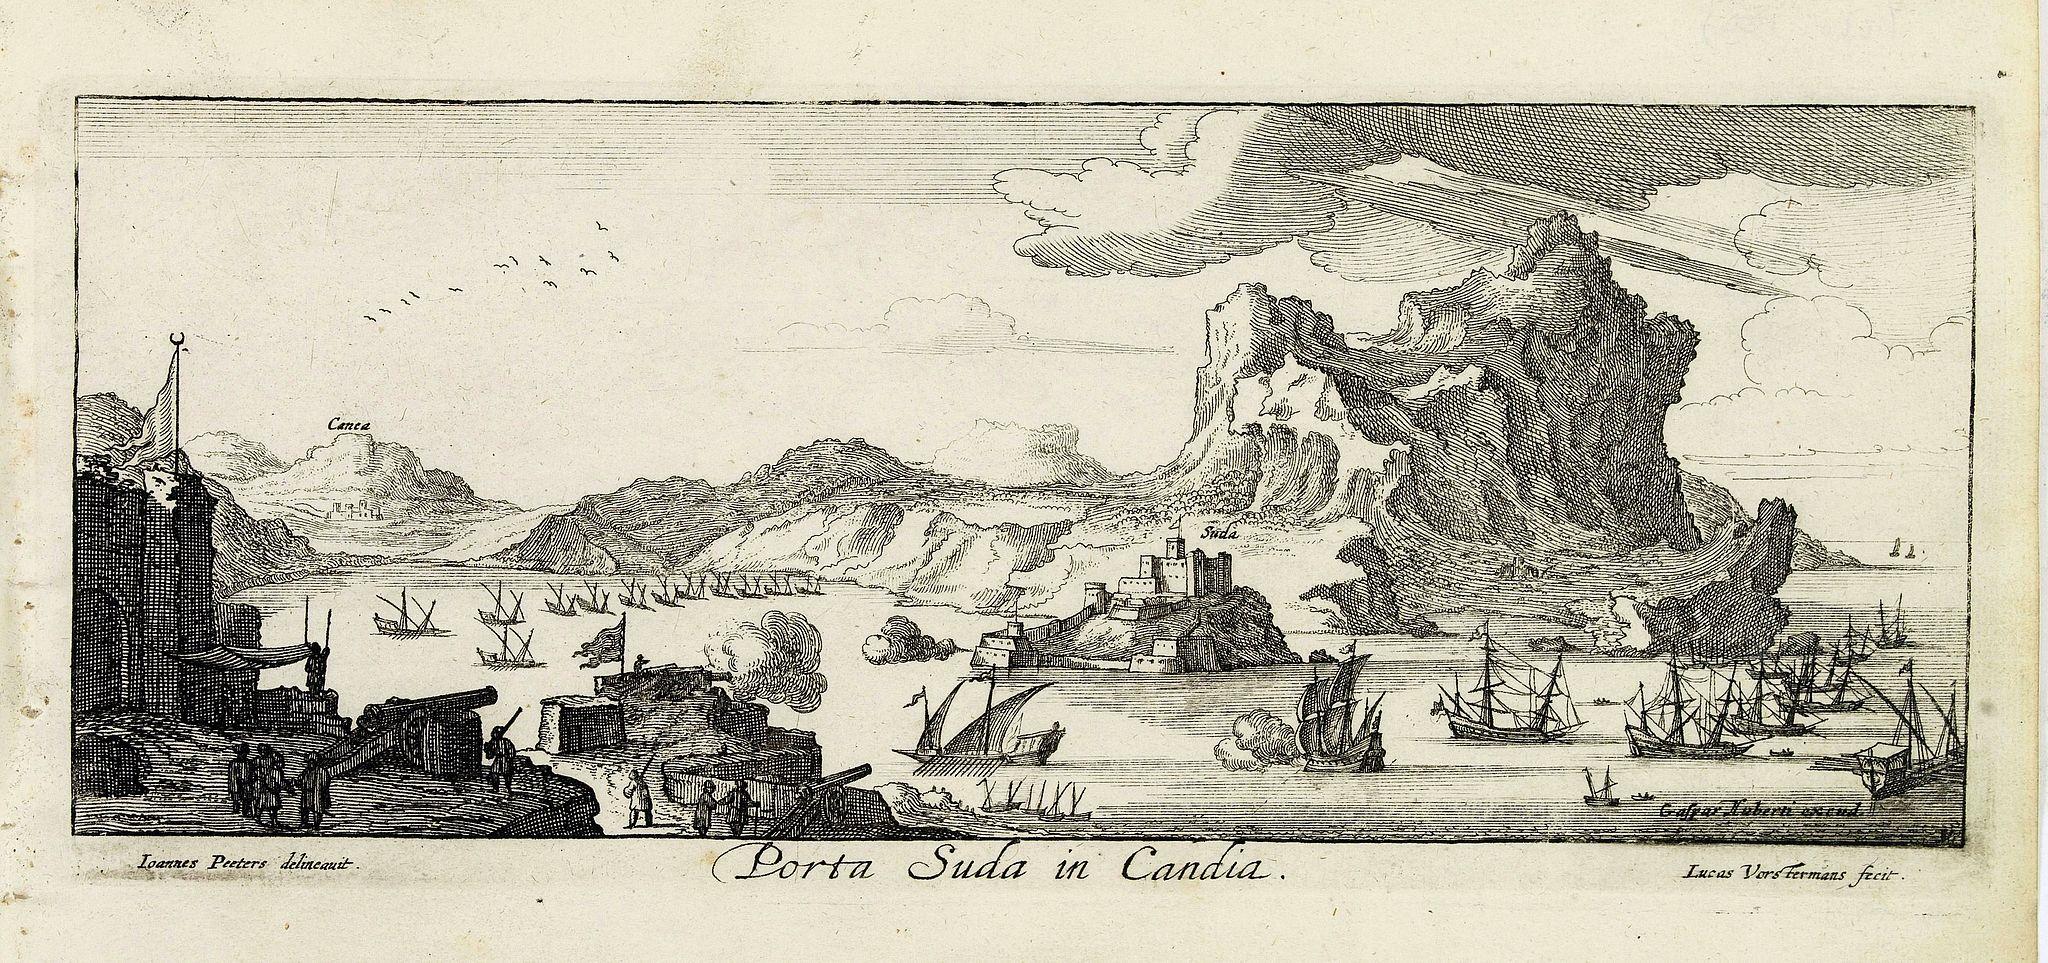 PEETERS, J. / VOSTERMANS II, L. -  Porta Suda Paleo in Candia. (Souda)